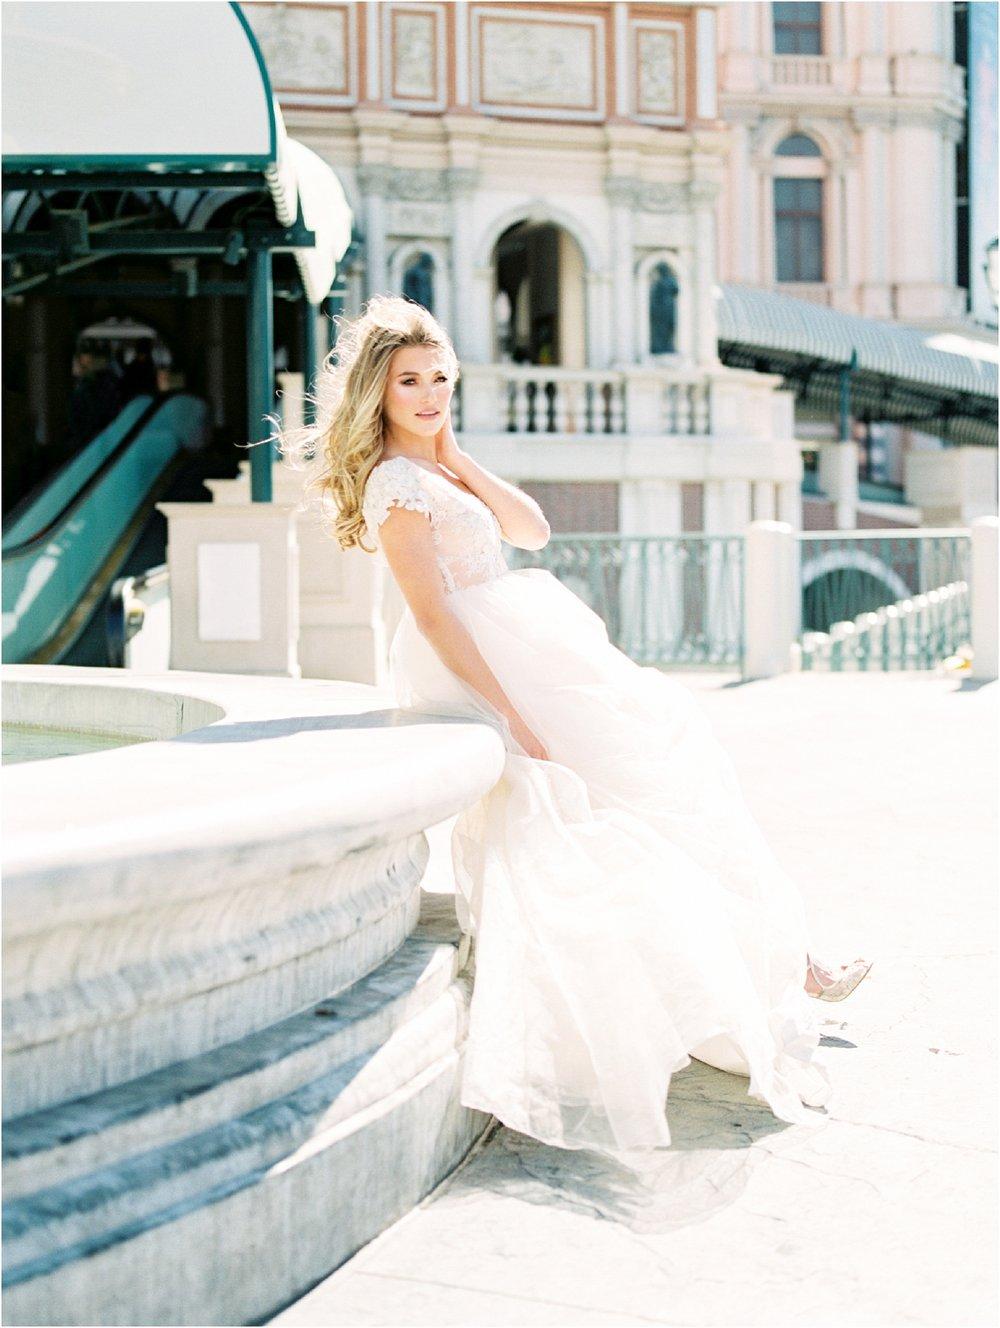 Lisa Silva Photography- Ponte Vedra Beach, St. Augustine and Jacksonville, Florida Fine Art Film Wedding and Boudoir Photography- Fine Art Film Bridal Editorial at the Venitian, Las Vegas_0025.jpg